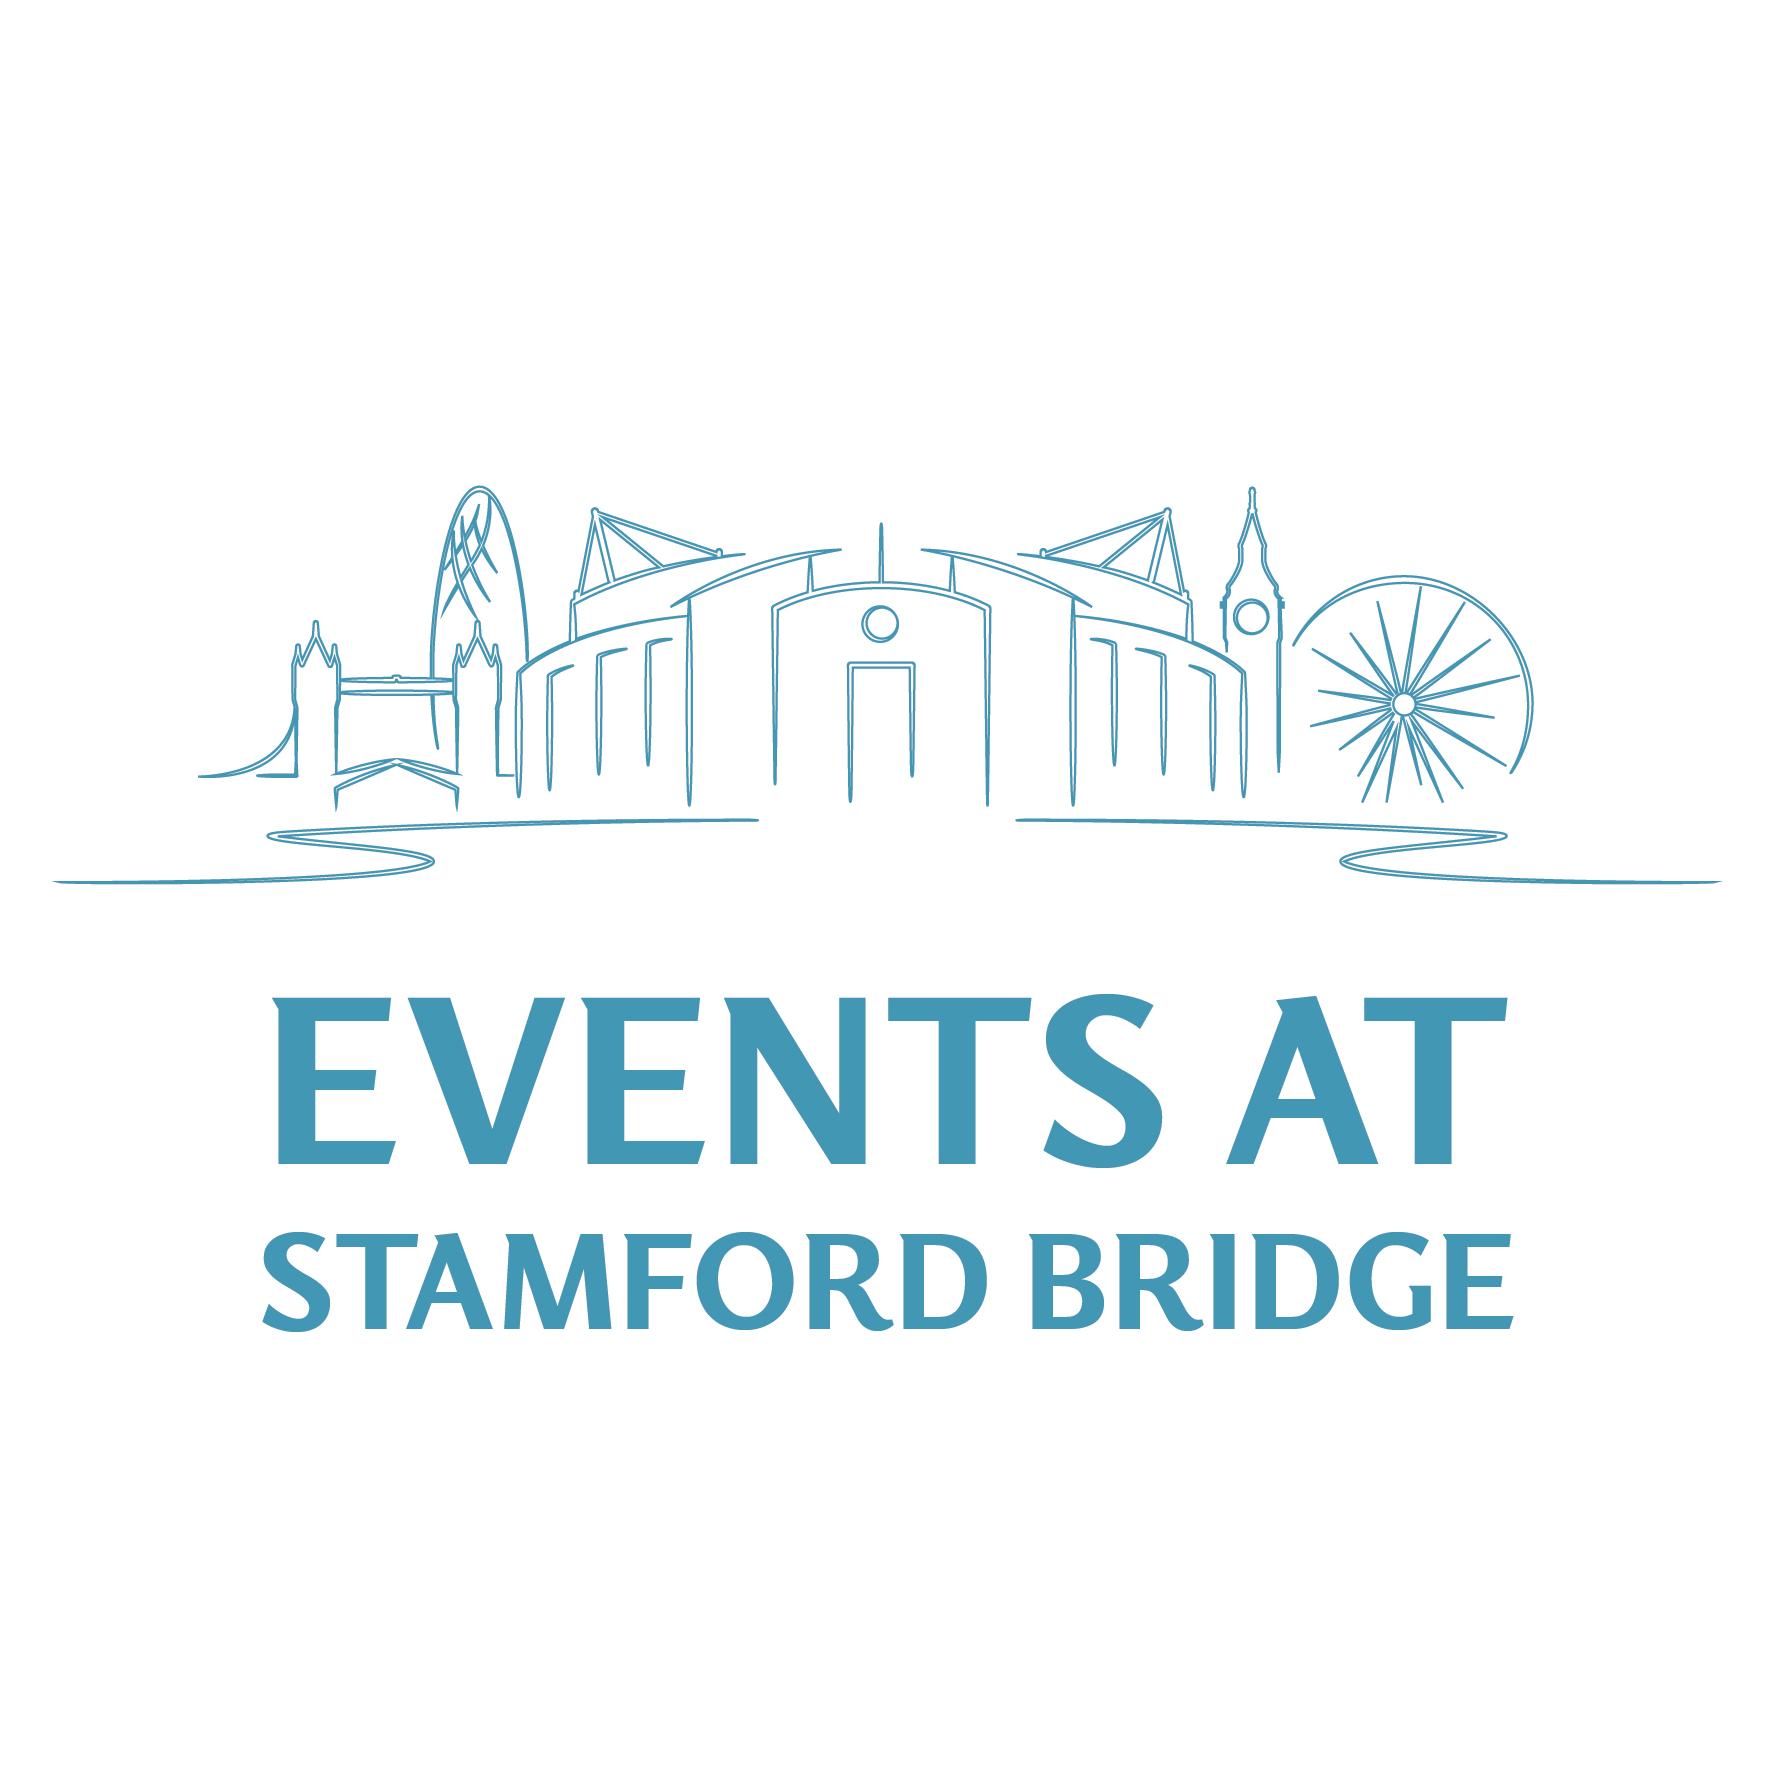 Events-at-stamford-bridge-logo-01